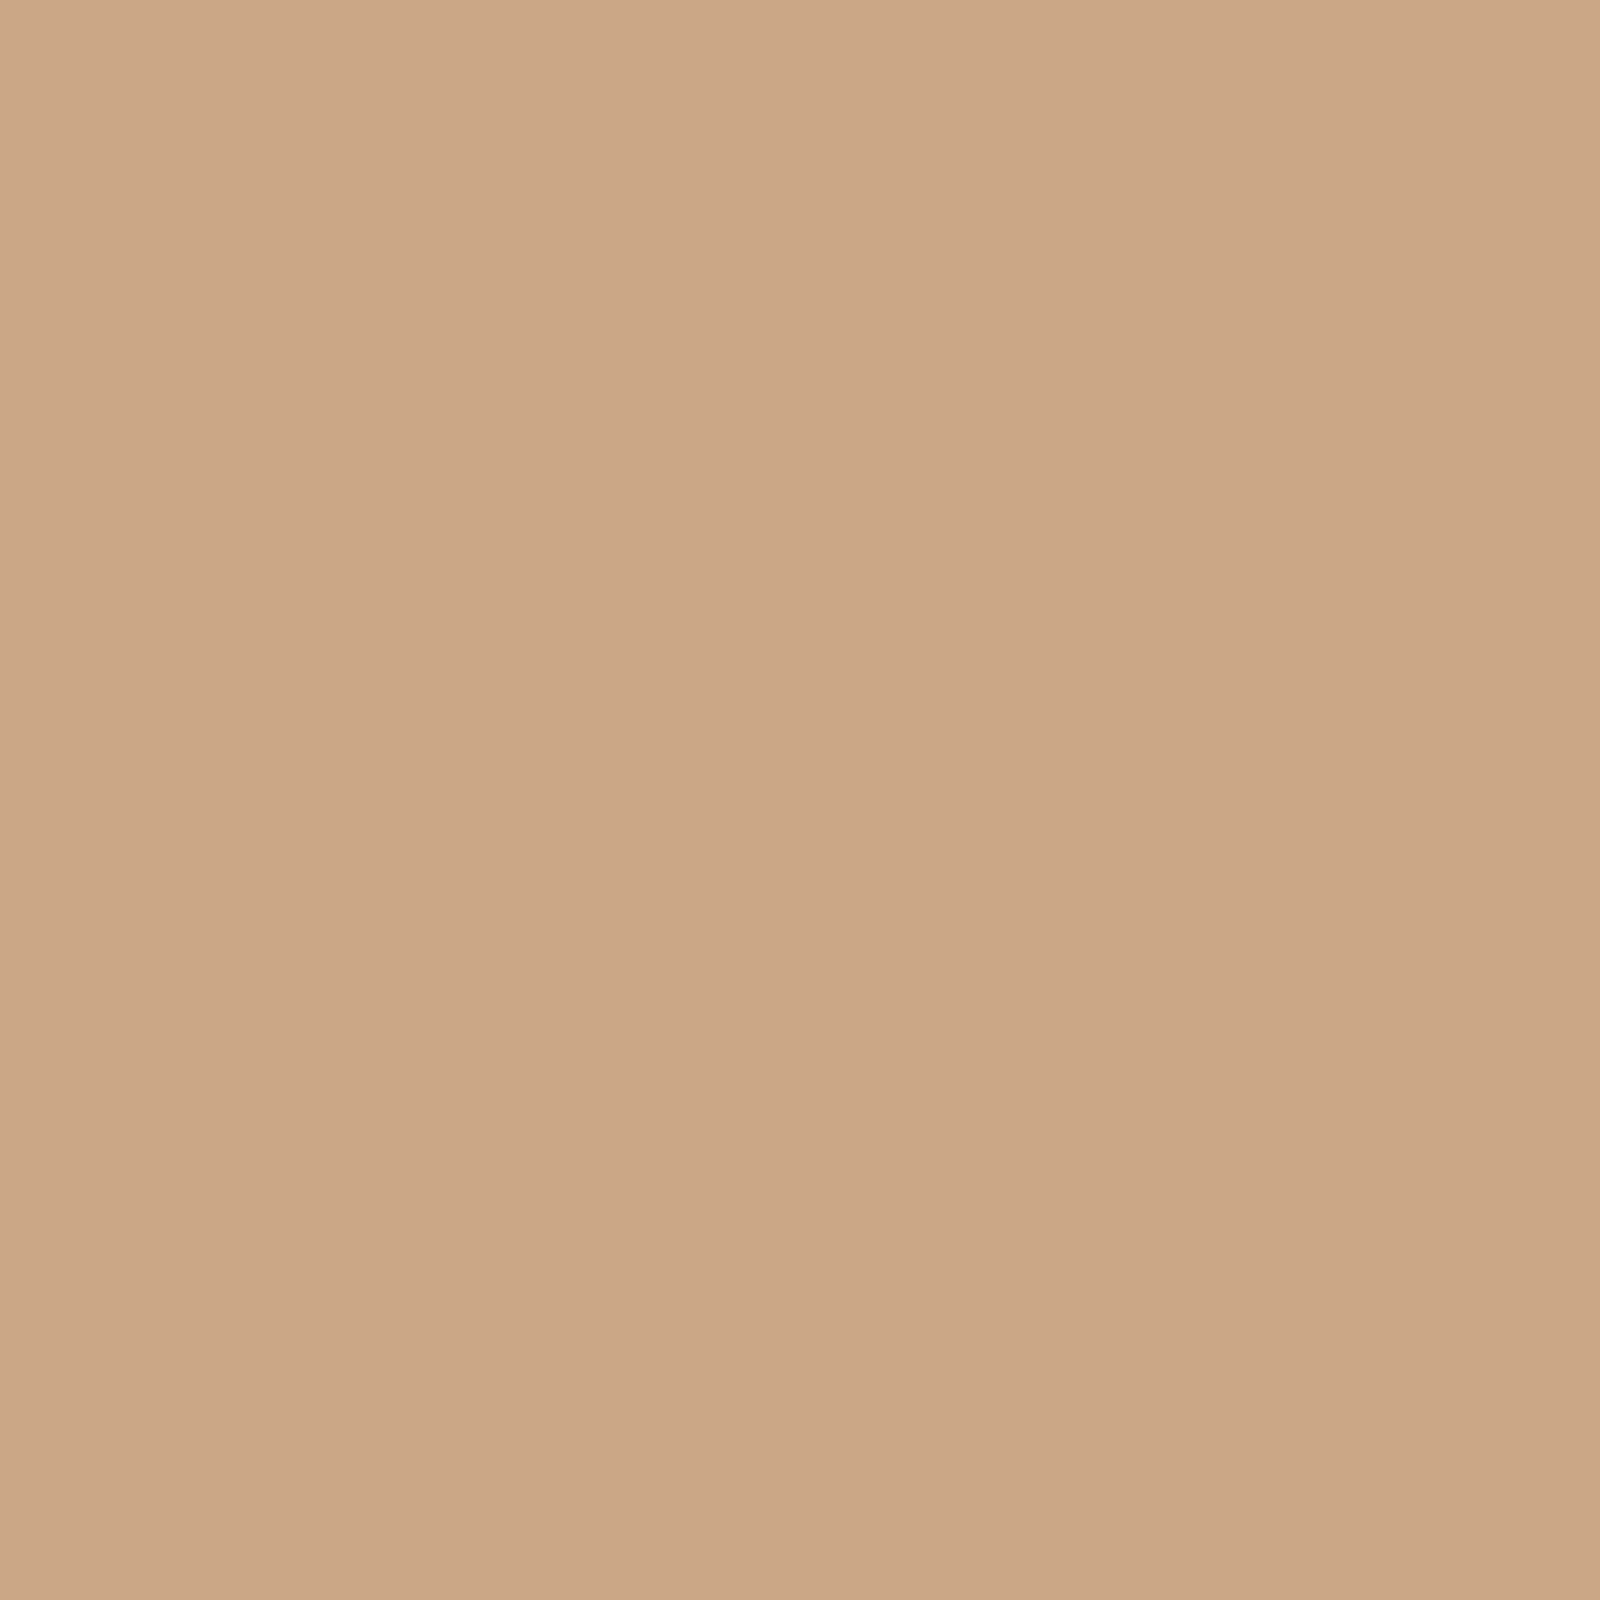 kobra maro scoarta